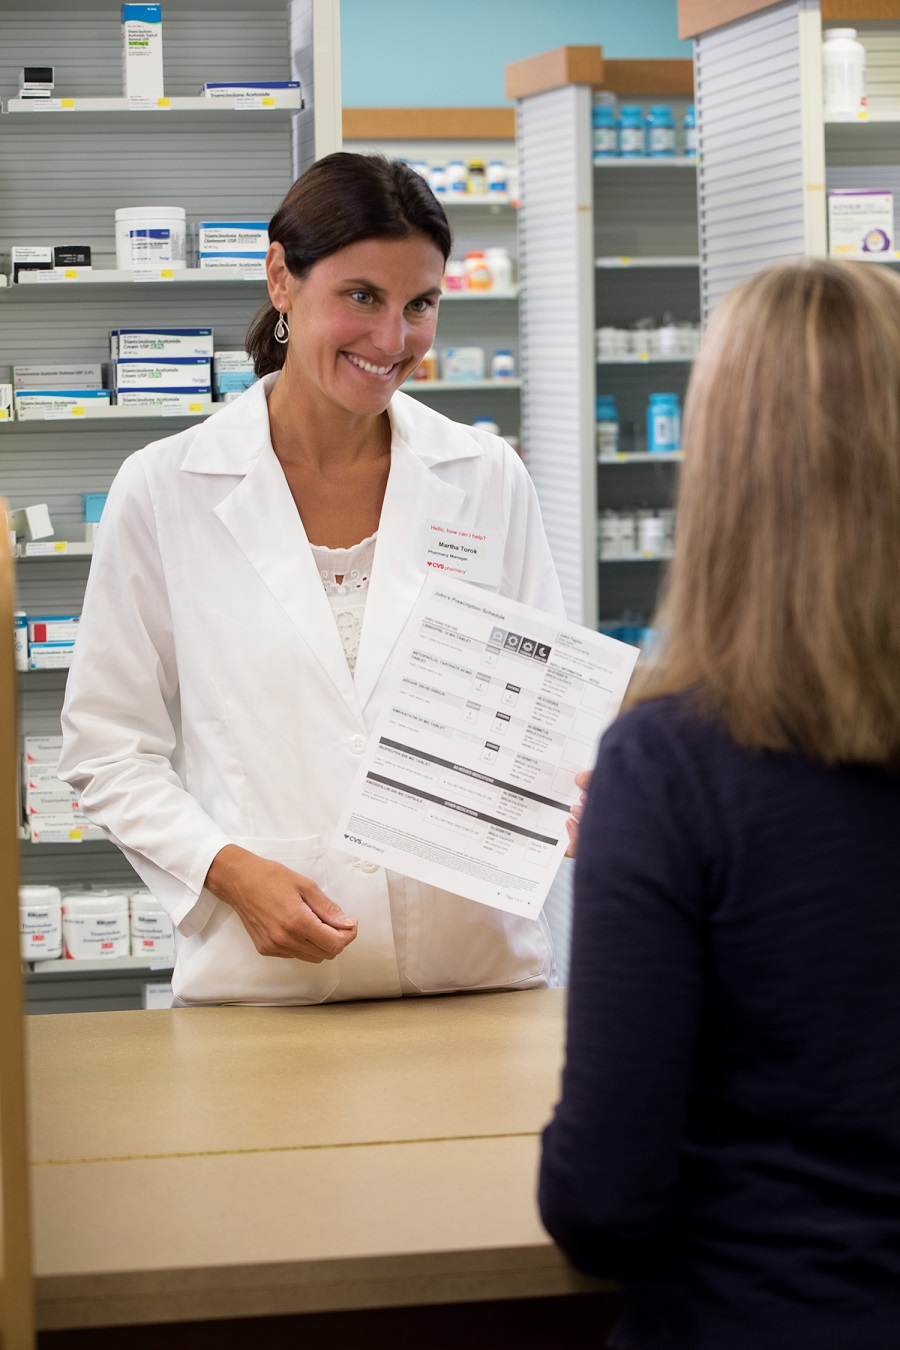 CVS Pharmacist consult on ScriptPath prescription schedule